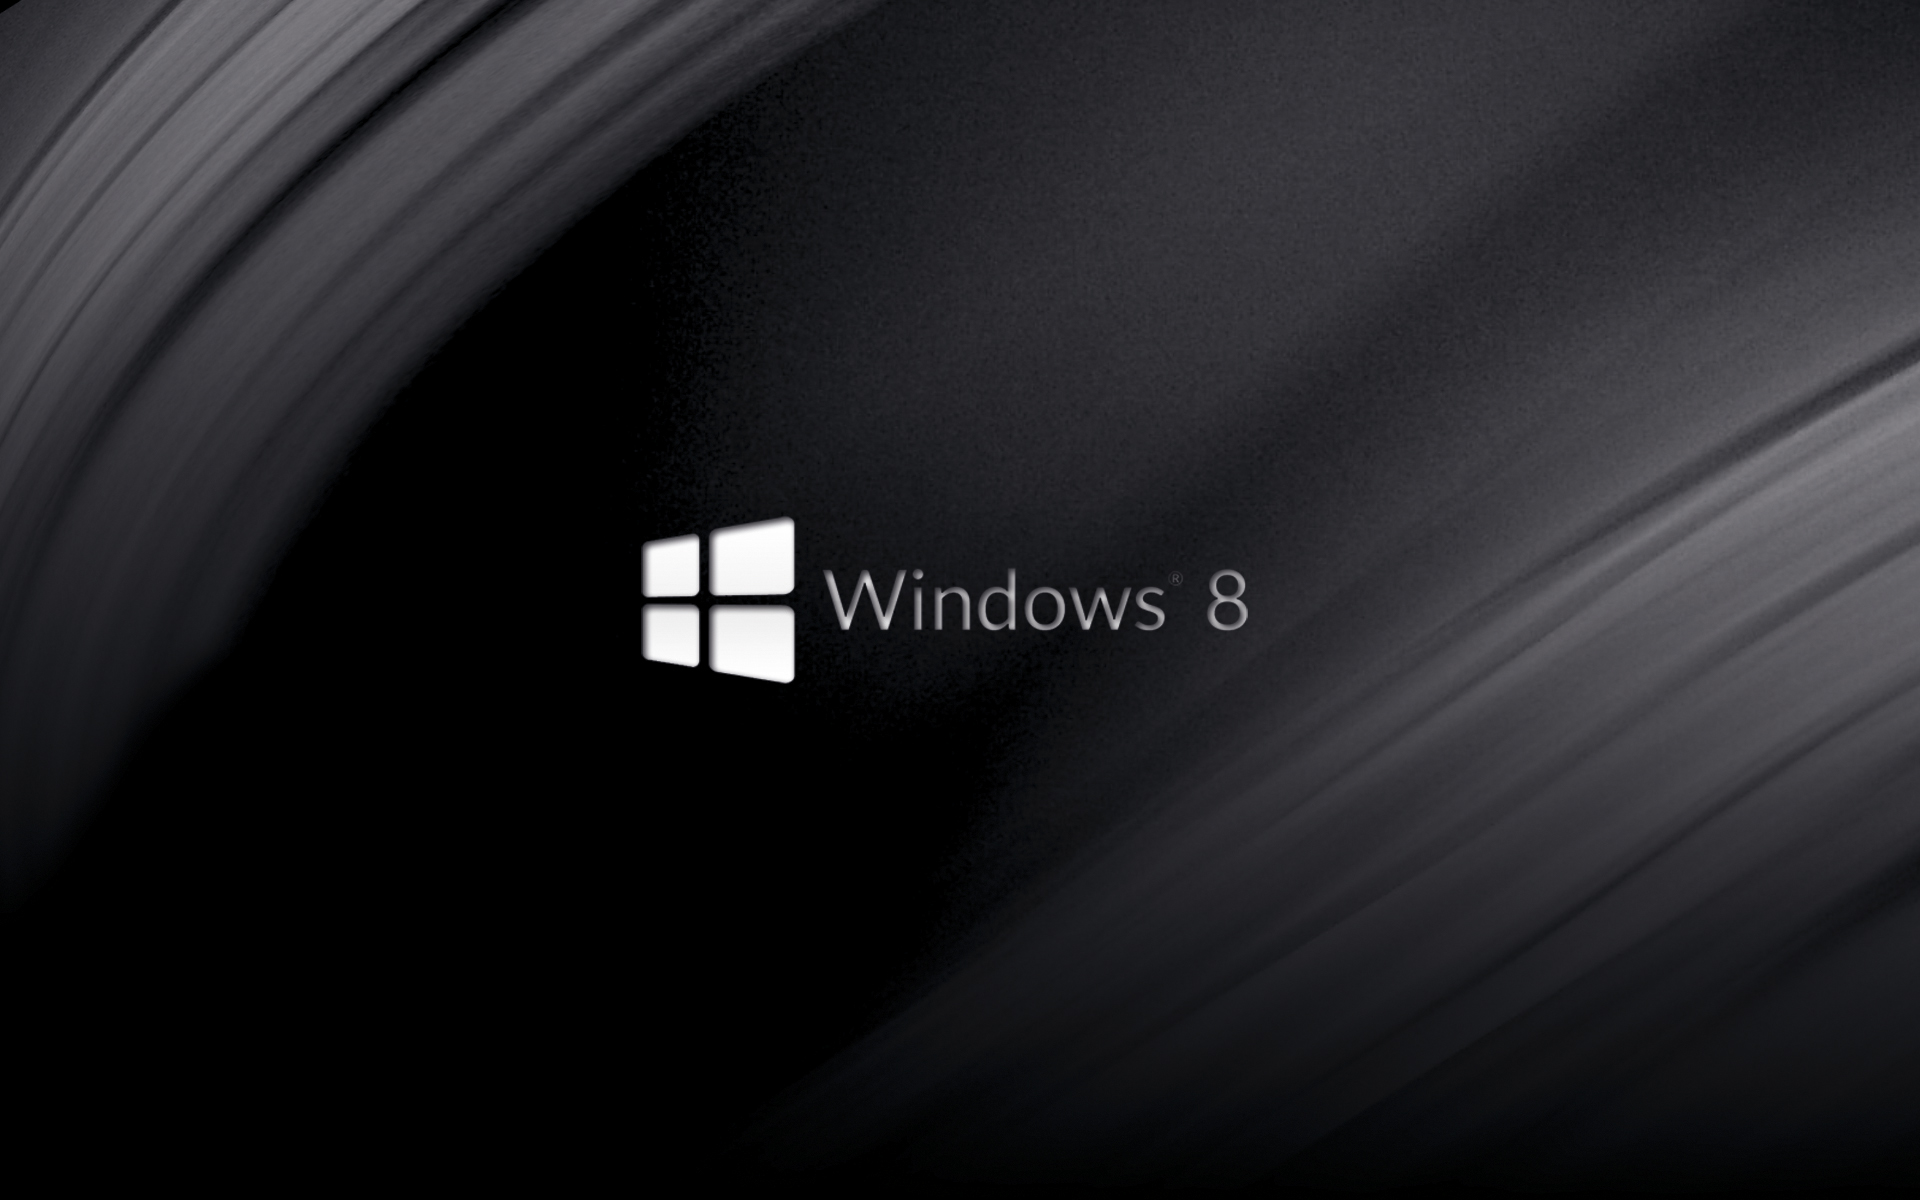 Photo Collection Windows 8 1 Black Wallpaper